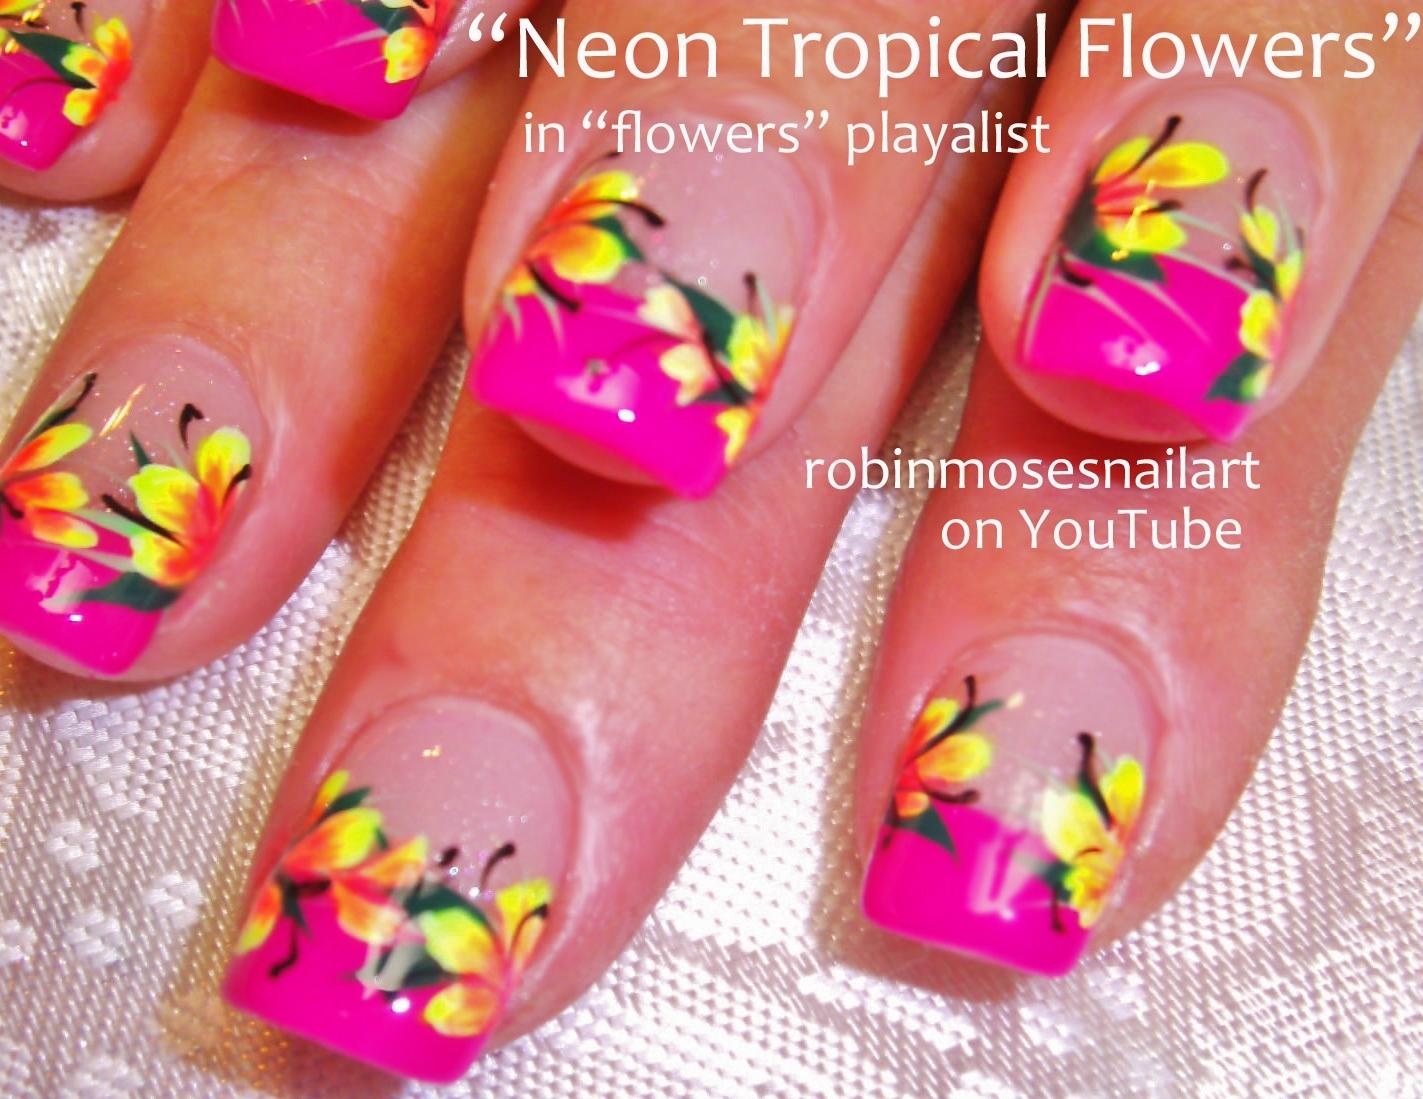 Neon Bright Spring Flower Nail Art!, Neon Rainbow Nails! Flower ...